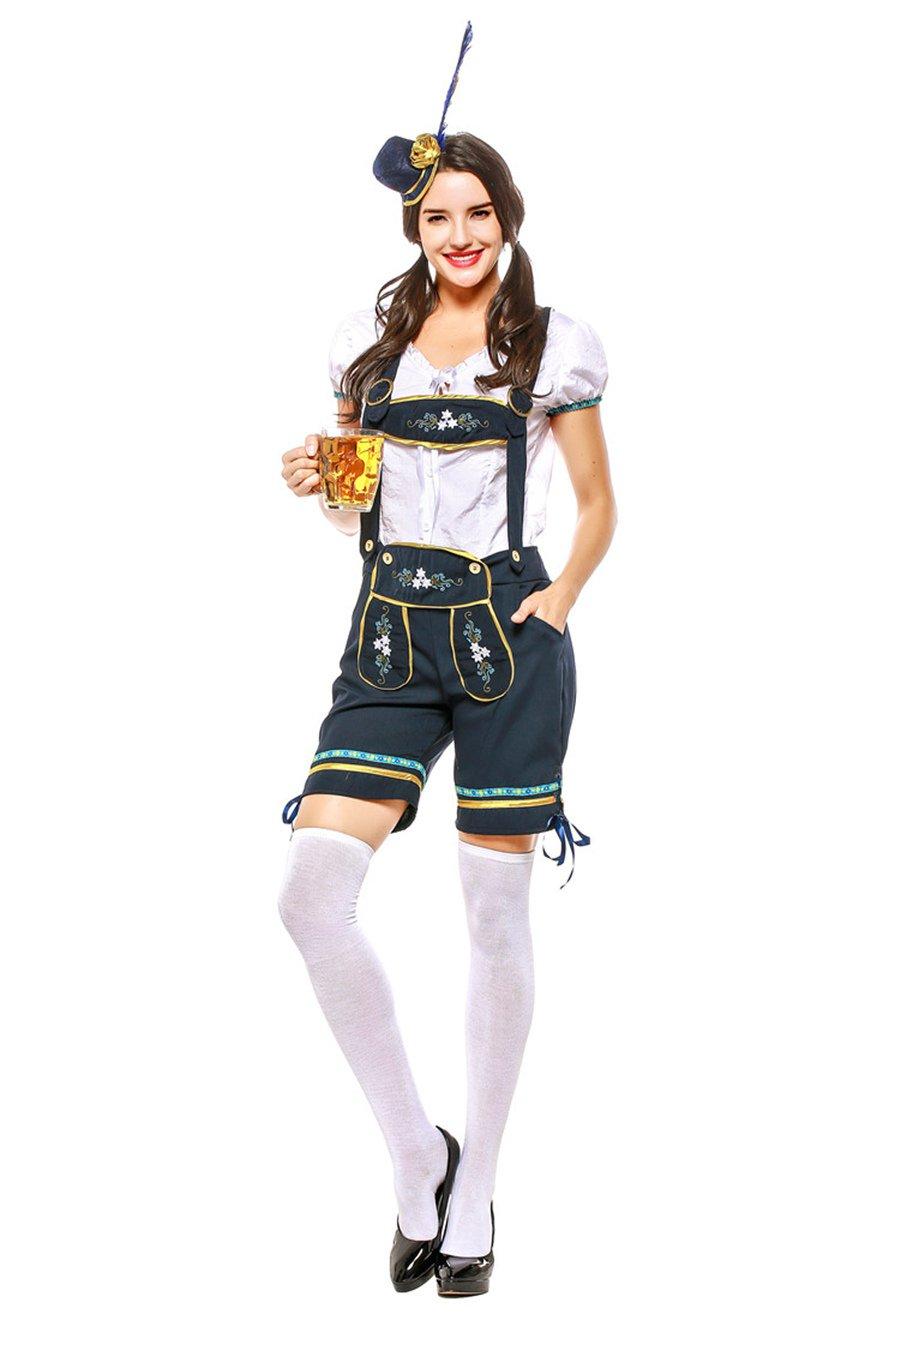 Bavarian Beer Overalls Uniform Mardi Gras Women Oktoberfest Costume Carnival Hansel Cosplay Clothing